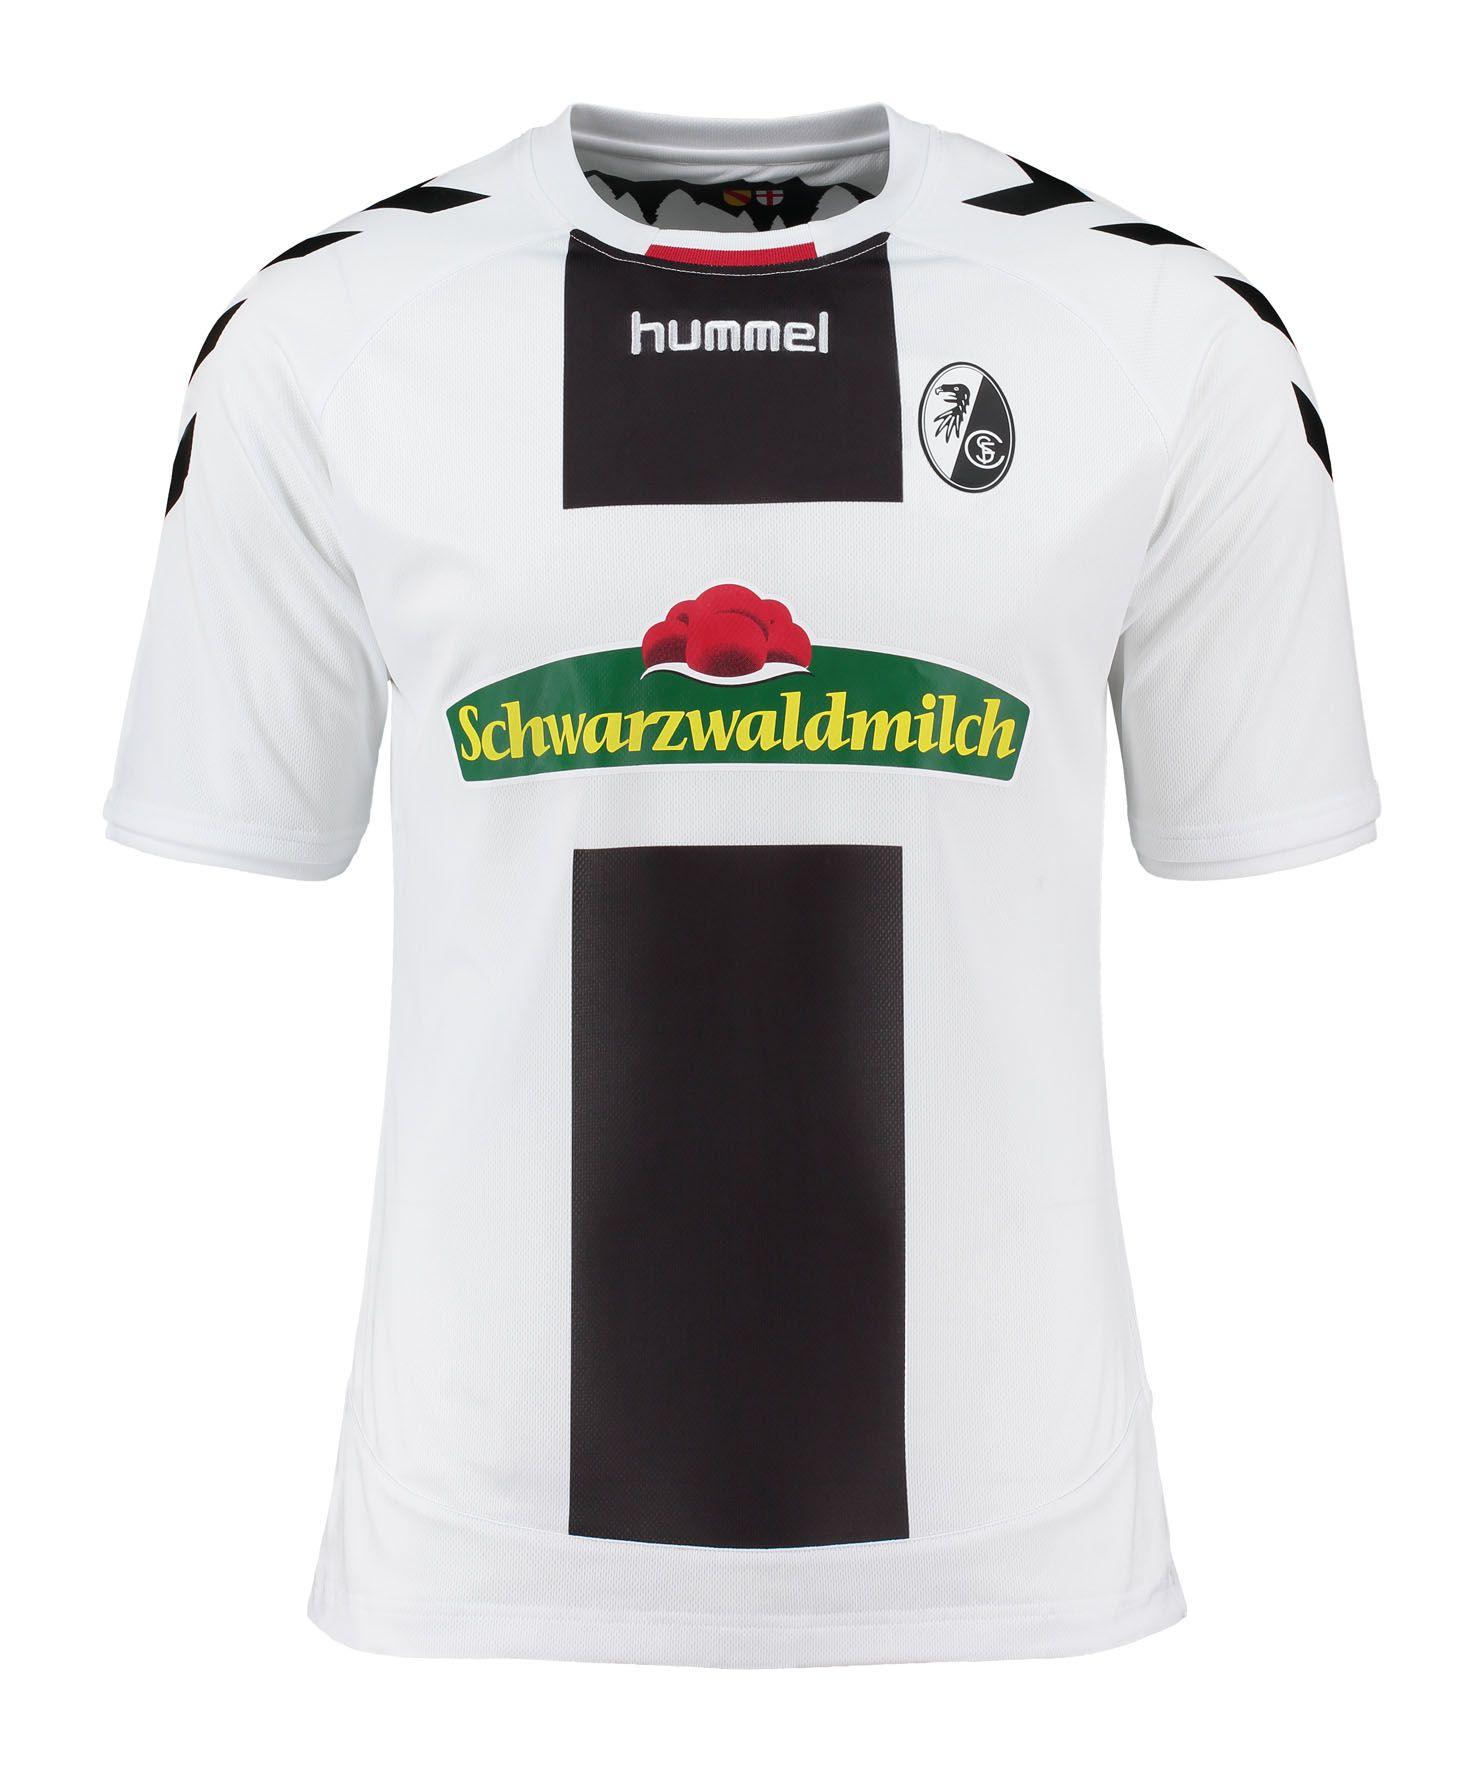 ae6cbd44d3e SC Freiburg (Germany) - 2016 2017 Hummel Away Shirt